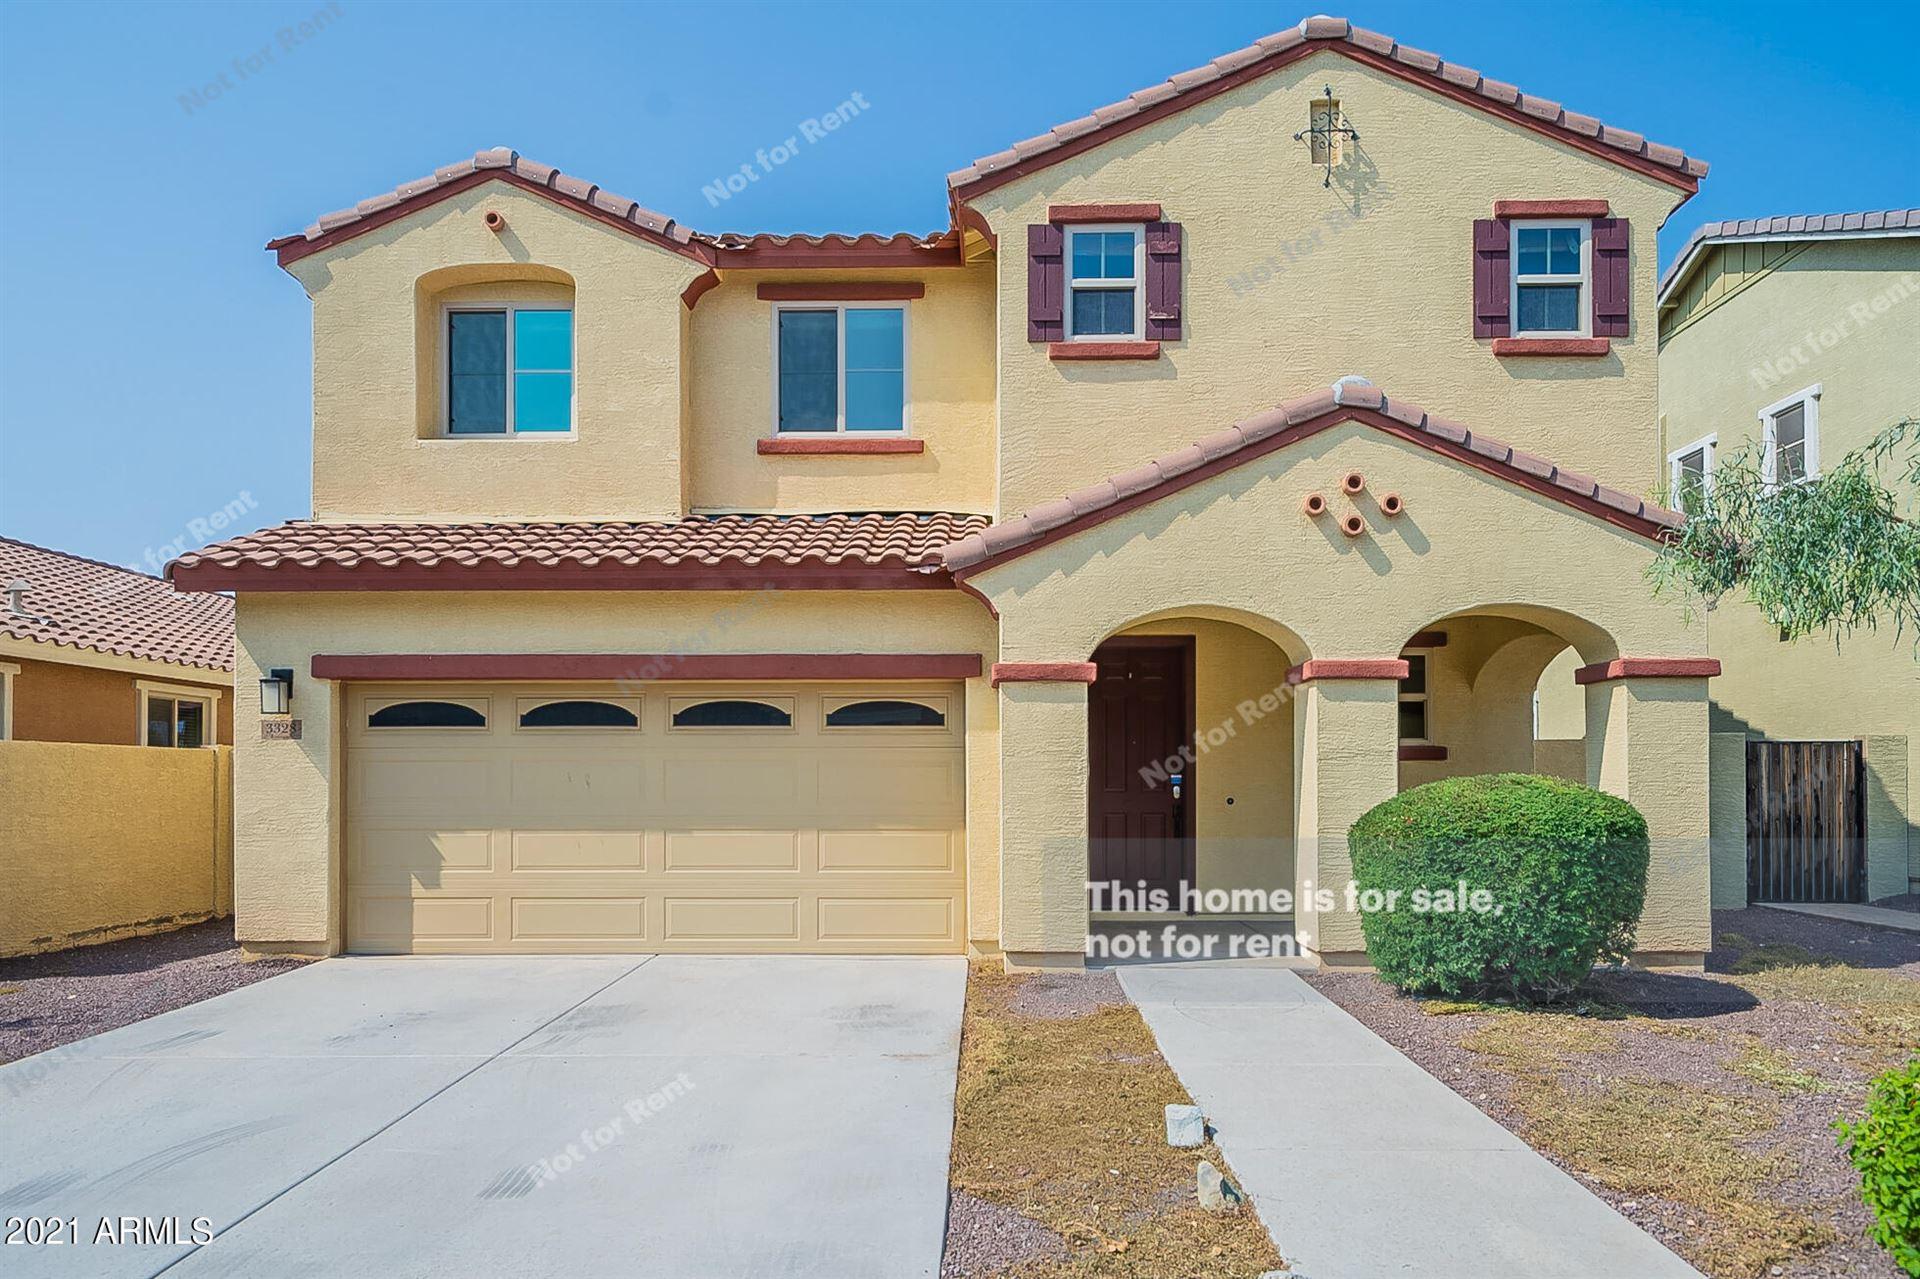 3328 E ROCHELLE Street, Mesa, AZ 85213 - MLS#: 6280304